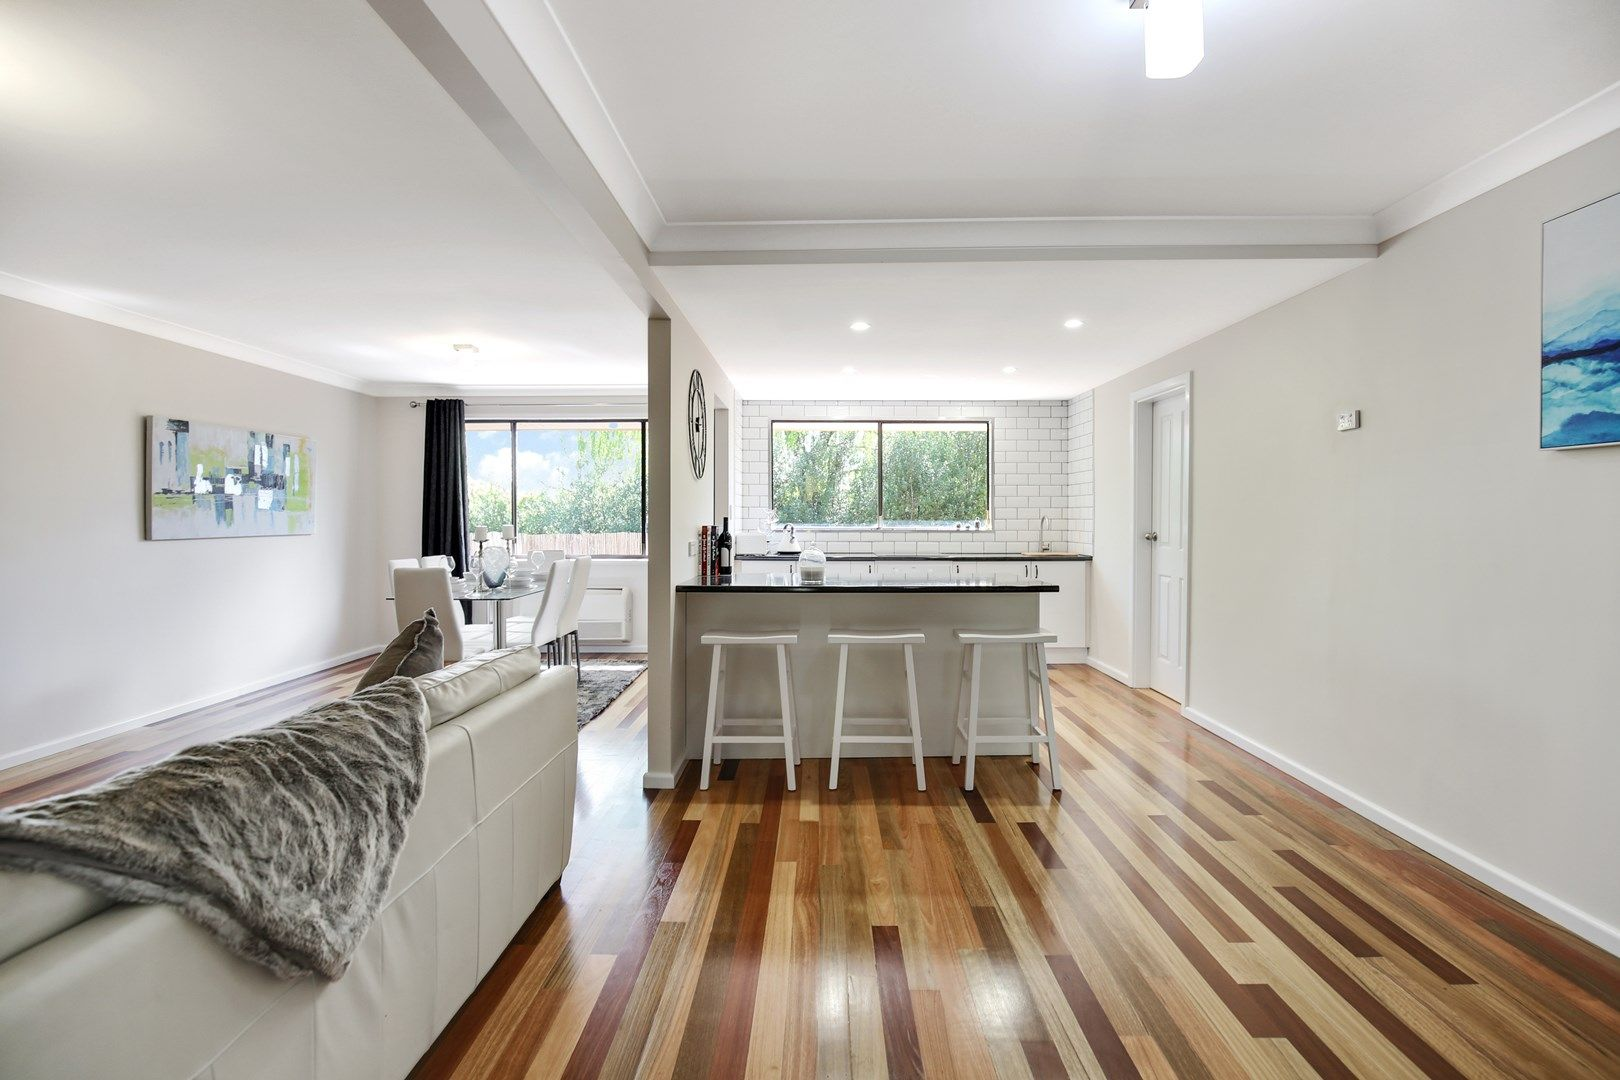 5/155 SAMPSON STREET, Orange NSW 2800, Image 0